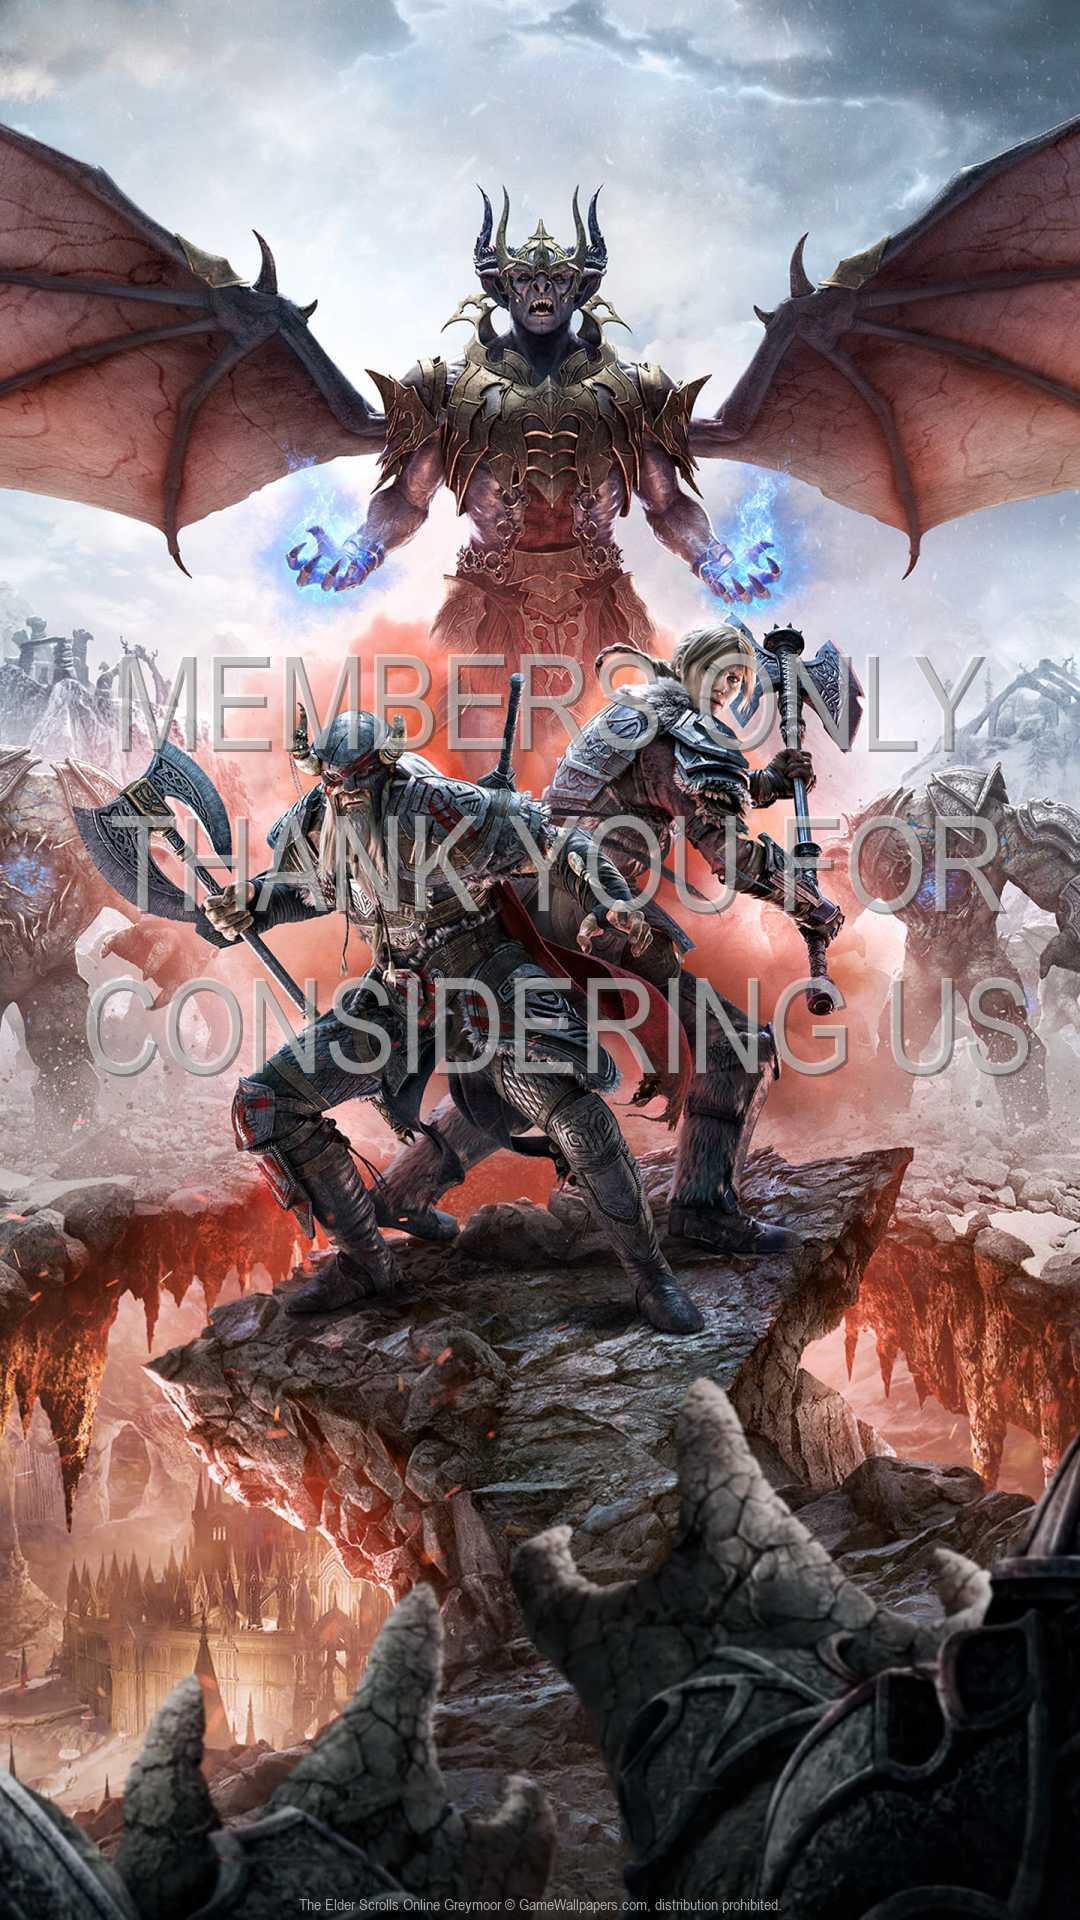 The Elder Scrolls Online: Greymoor 1080p Vertical Mobile wallpaper or background 02